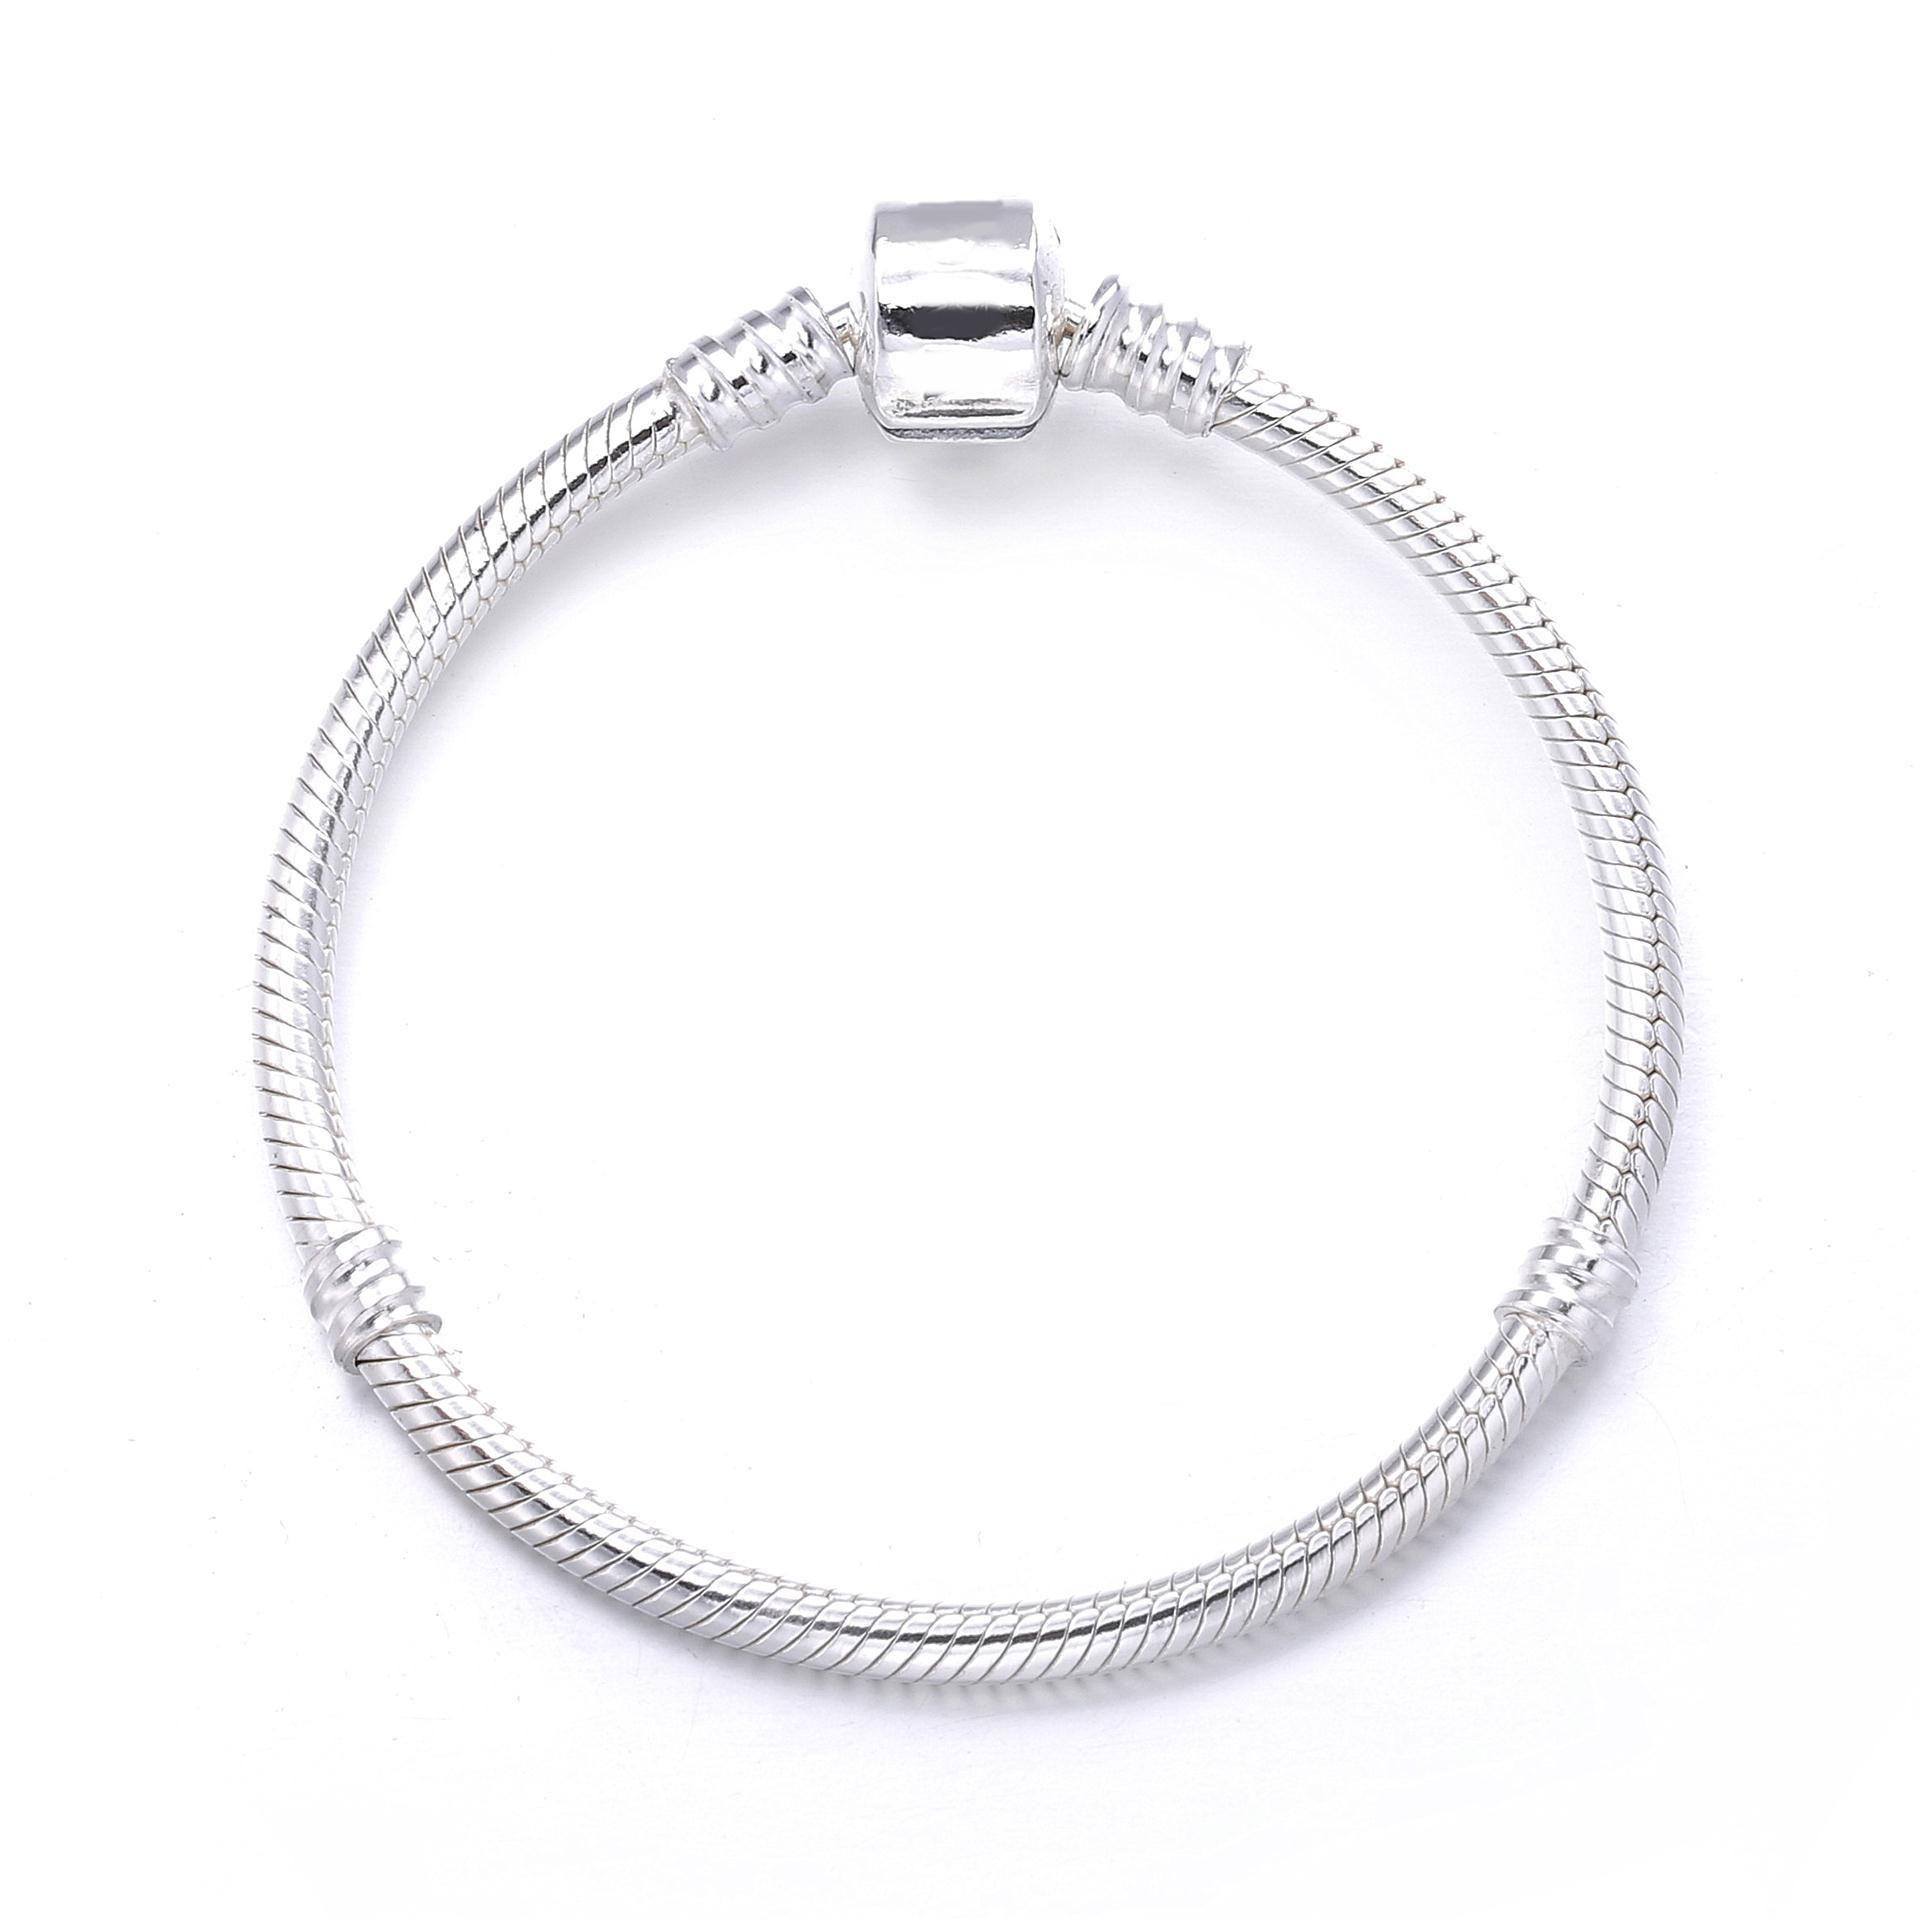 PDB6 ZTUNG S925 Sterling Silver Snake Chain Bracelet classic bursting foundation DIY beads Beaded Bracelet